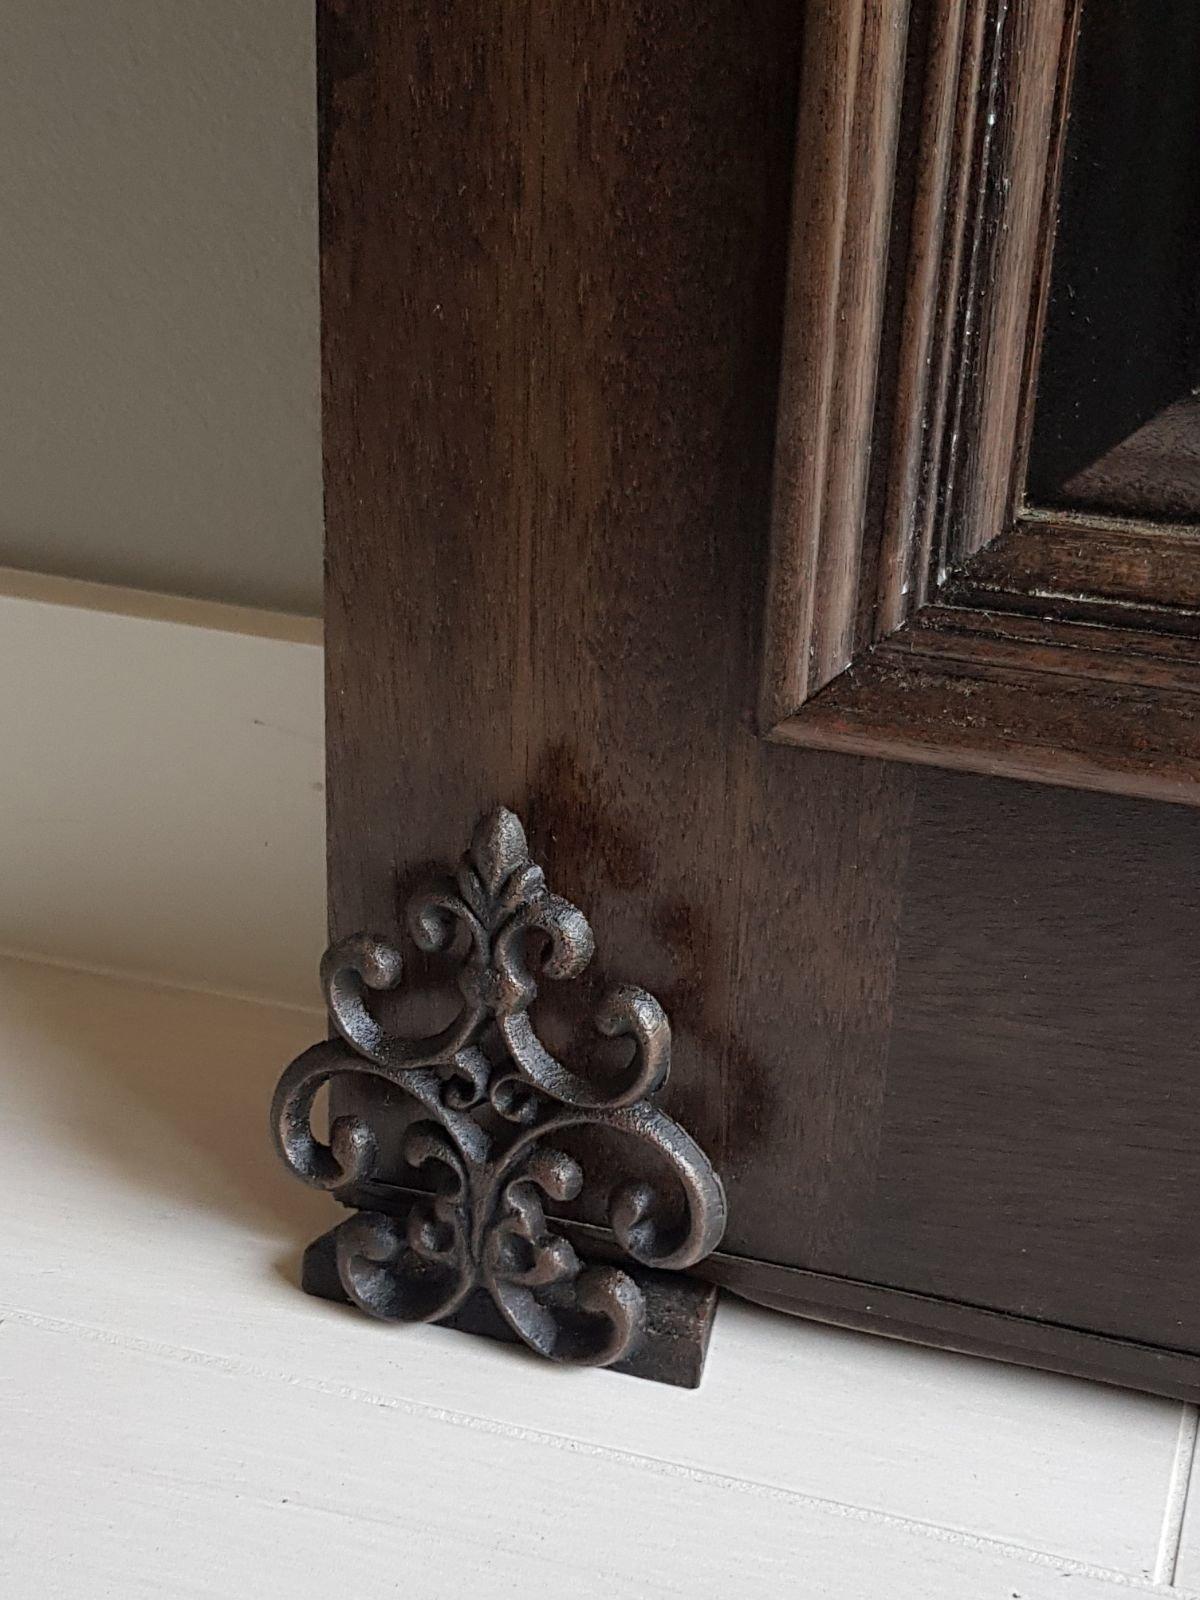 Lulu Decor, Cast Iron Fleur De Lis Door Stop, Door Stopper in Antique Black Finish, Beautiful and Useful Product (1) by Lulu Decor (Image #6)